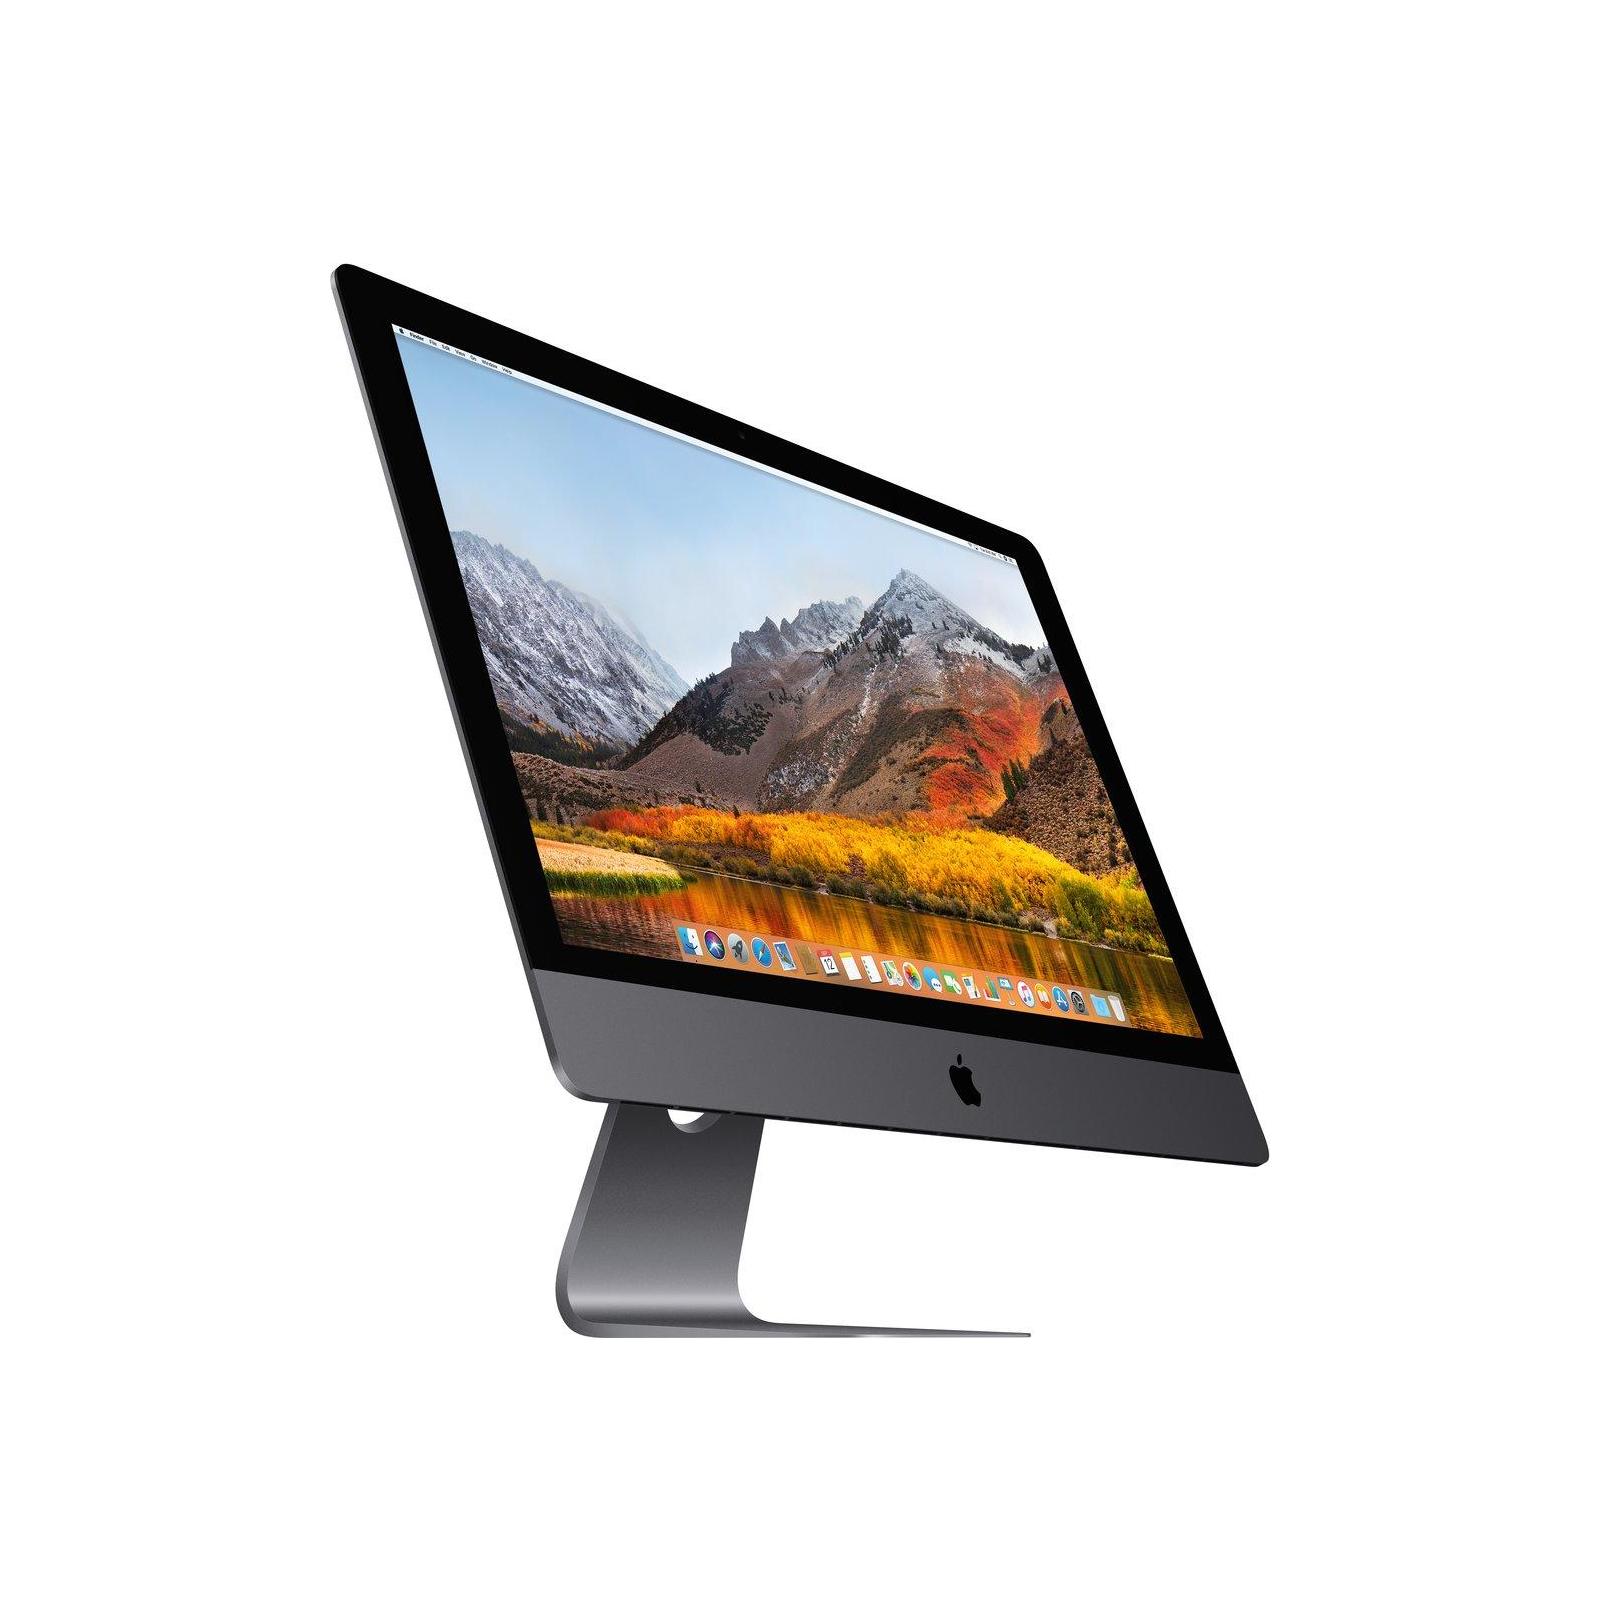 "Компьютер Apple A1862 iMac Pro 27"" Retina 5K (MQ2Y2UA/A) изображение 2"